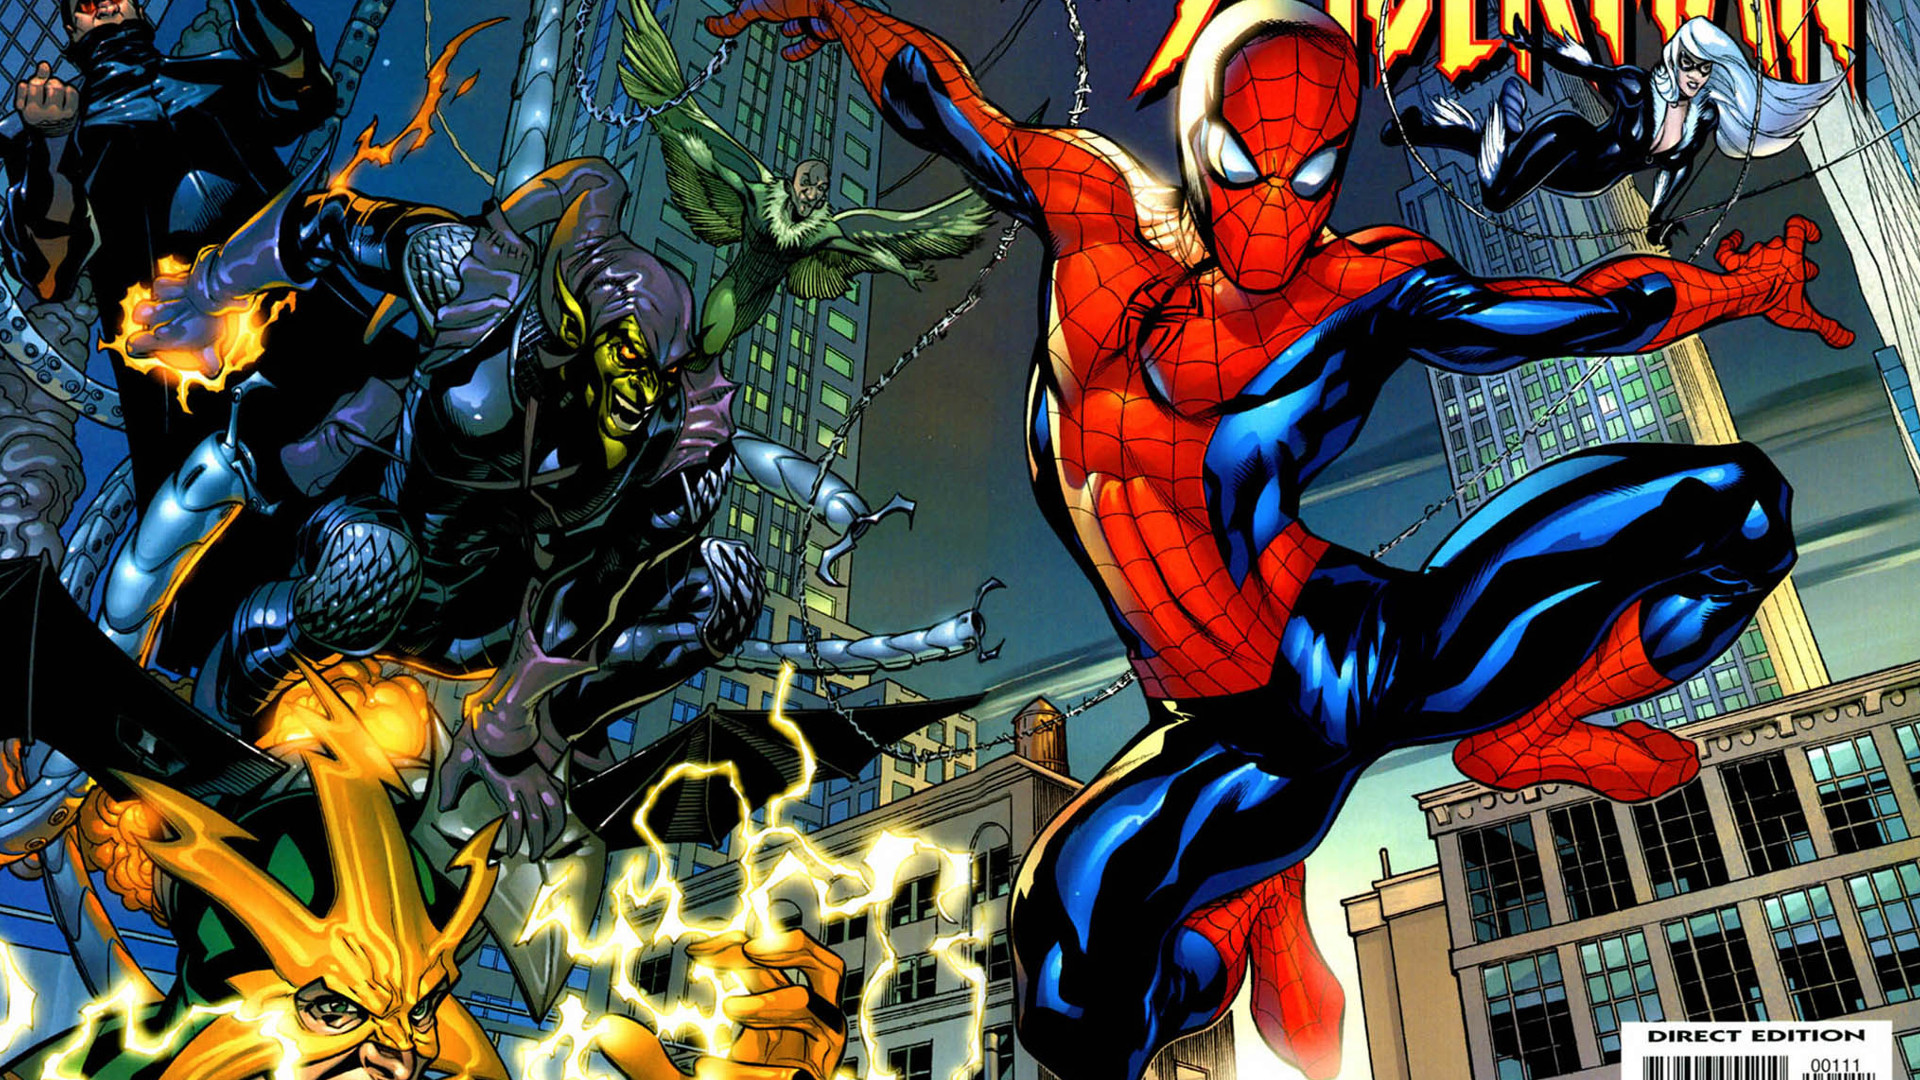 Spiderman comics spider-man superhero wallpaper | 1920x1080